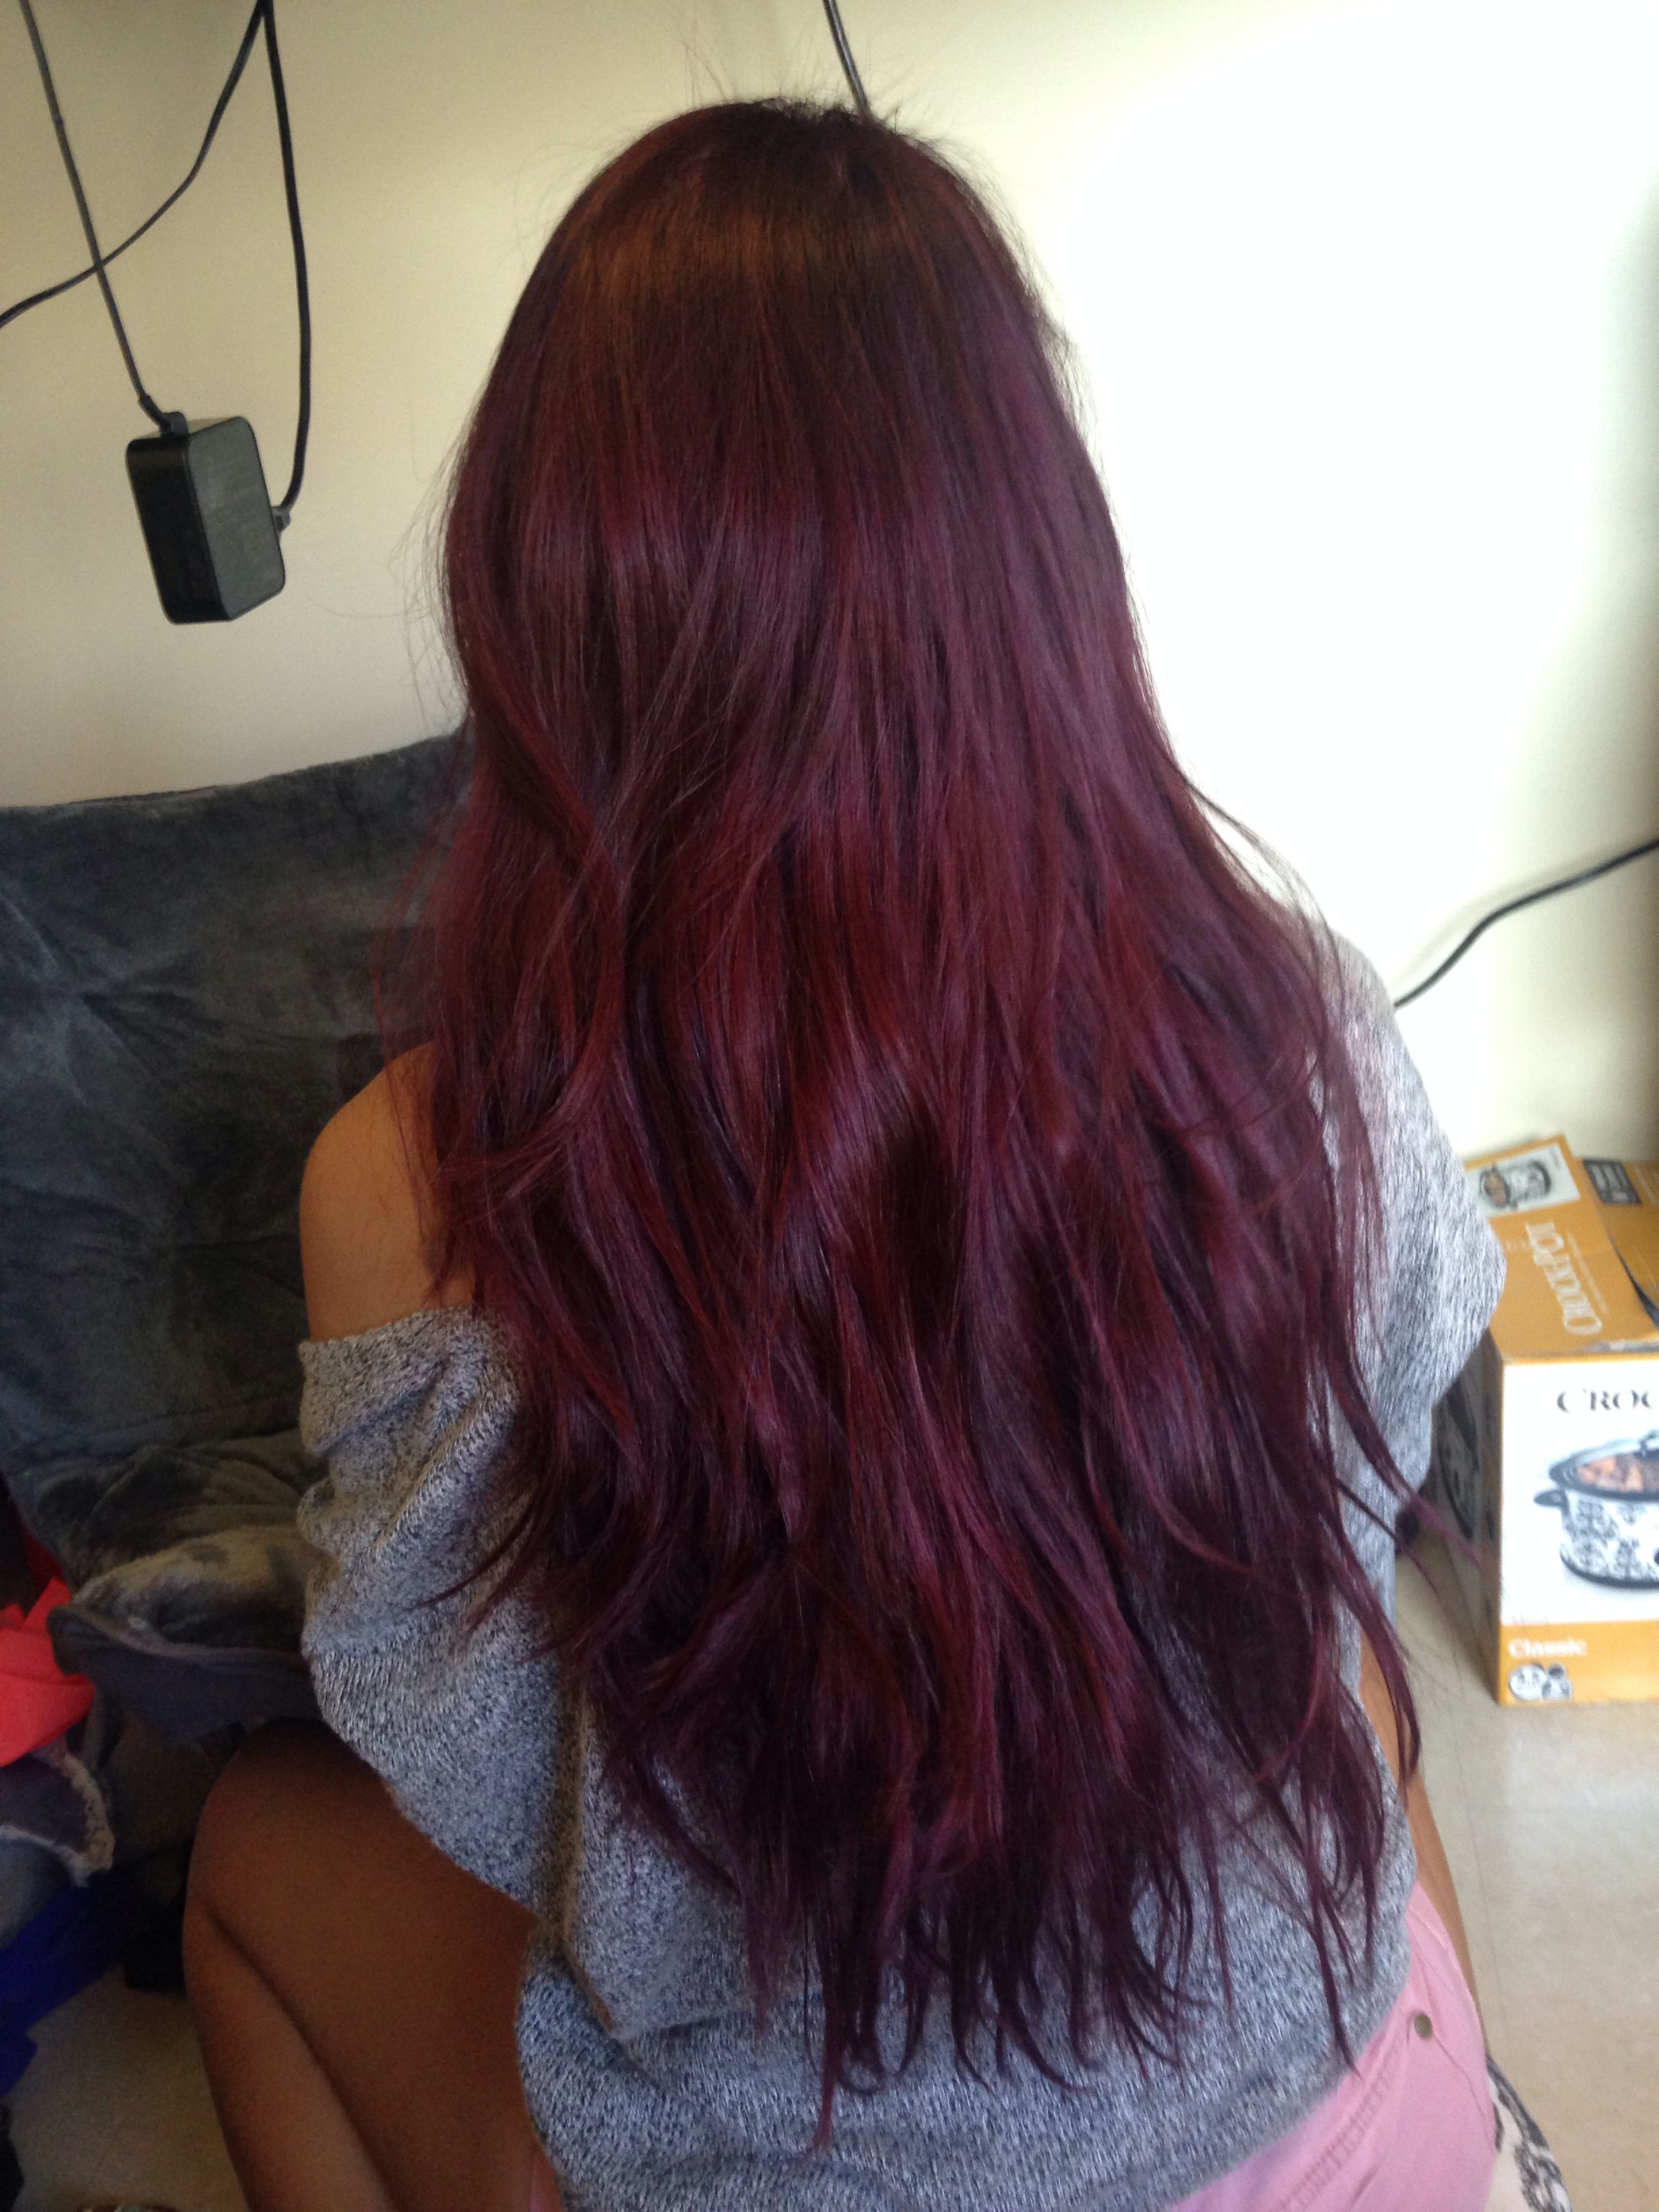 Merlot hair color - Purple Hair Vidal Sassoon London Lilac Box Dye My Current Hair Colour